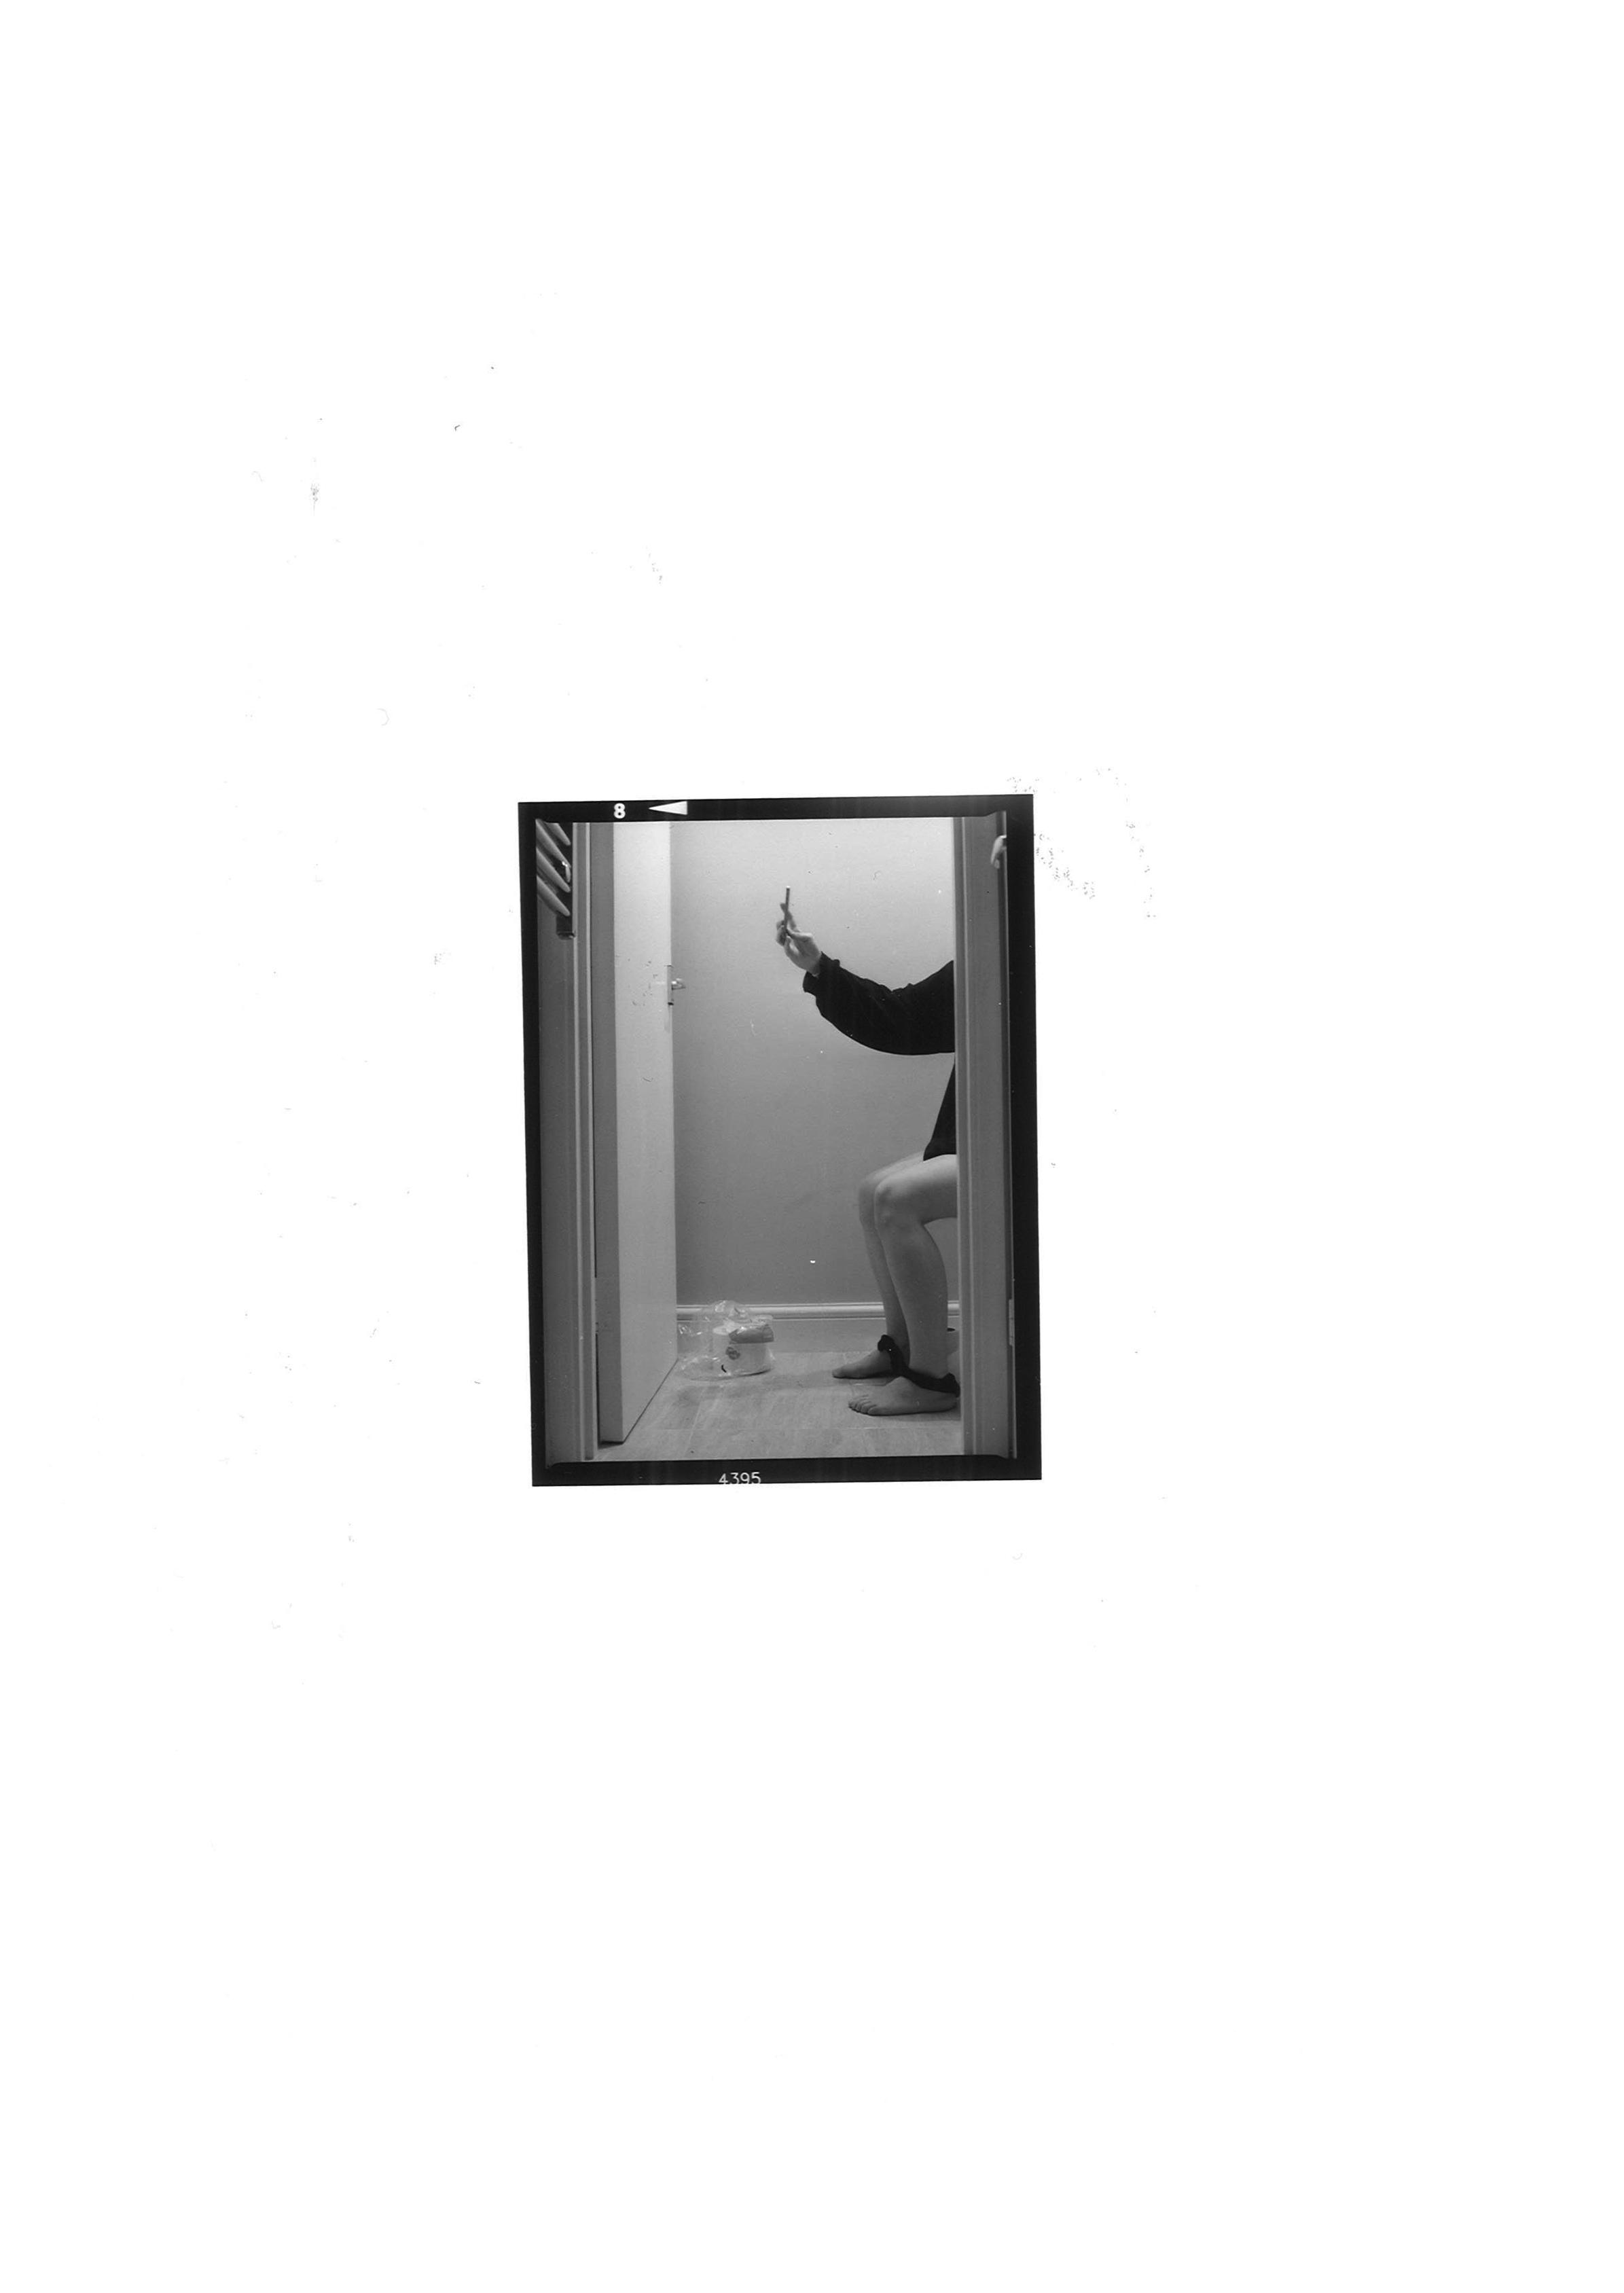 Toilet (2017)